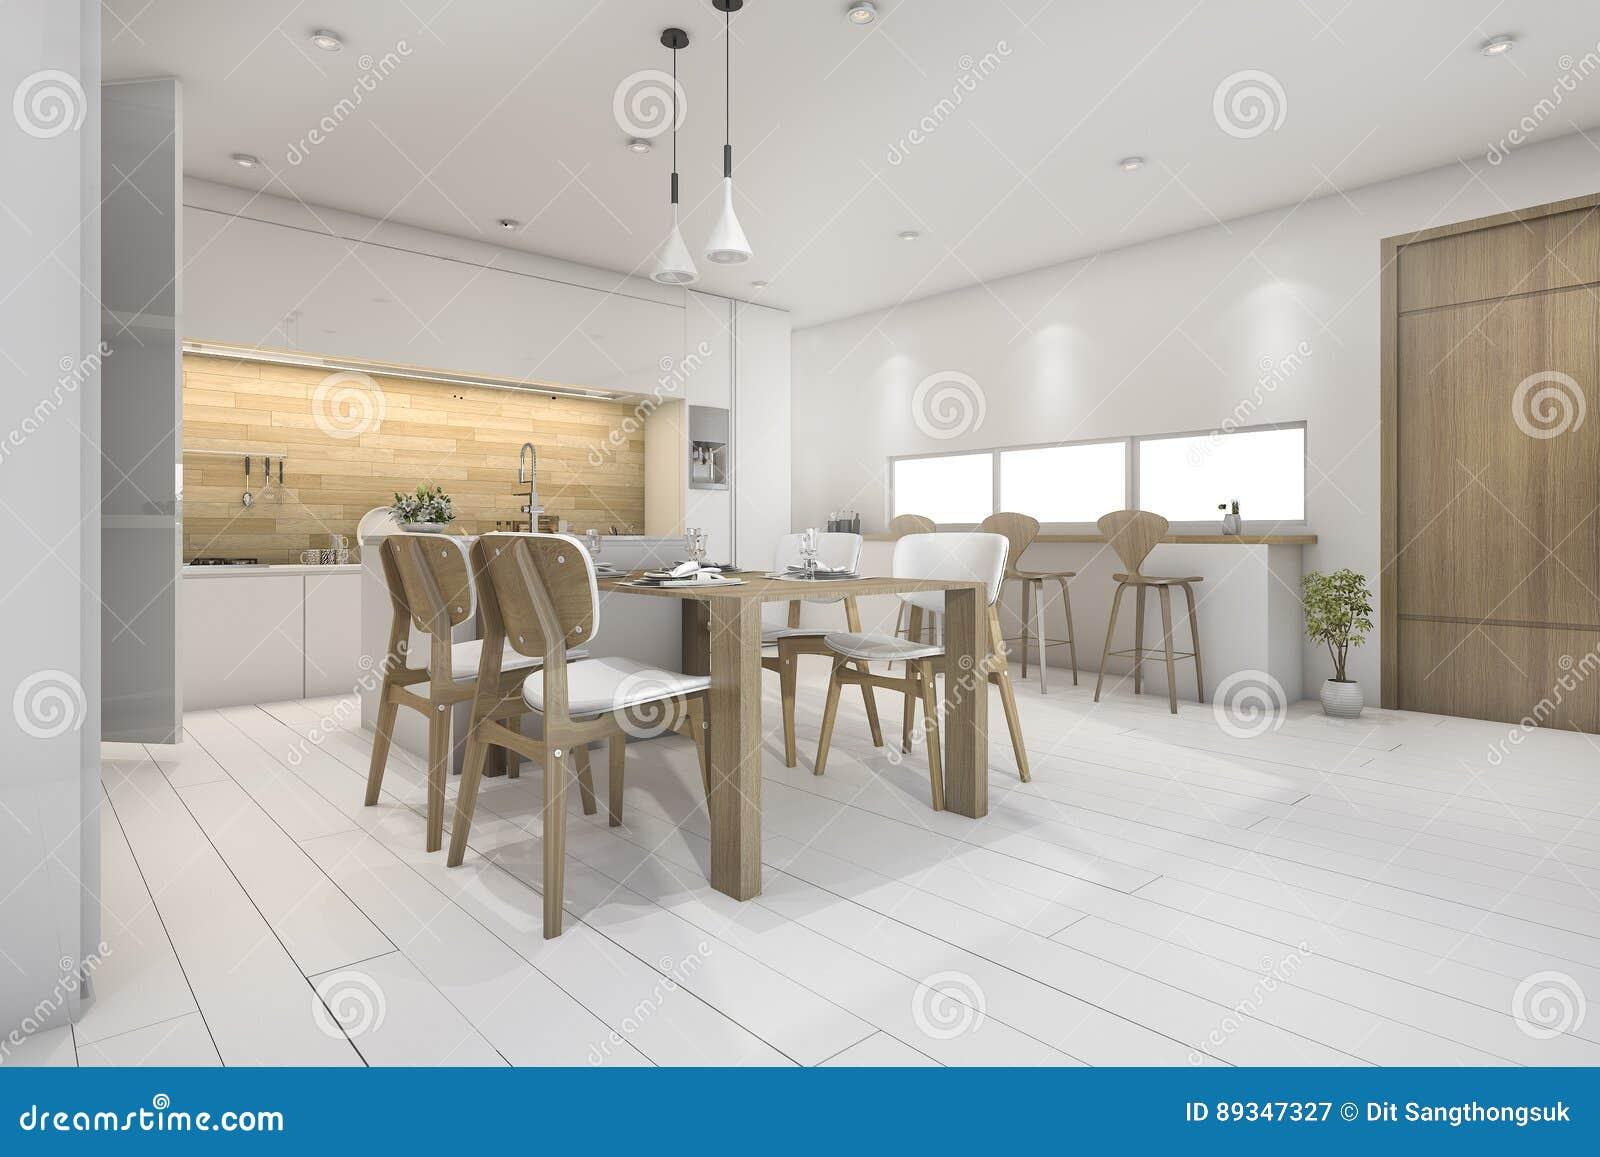 Cucina bianca tavolo